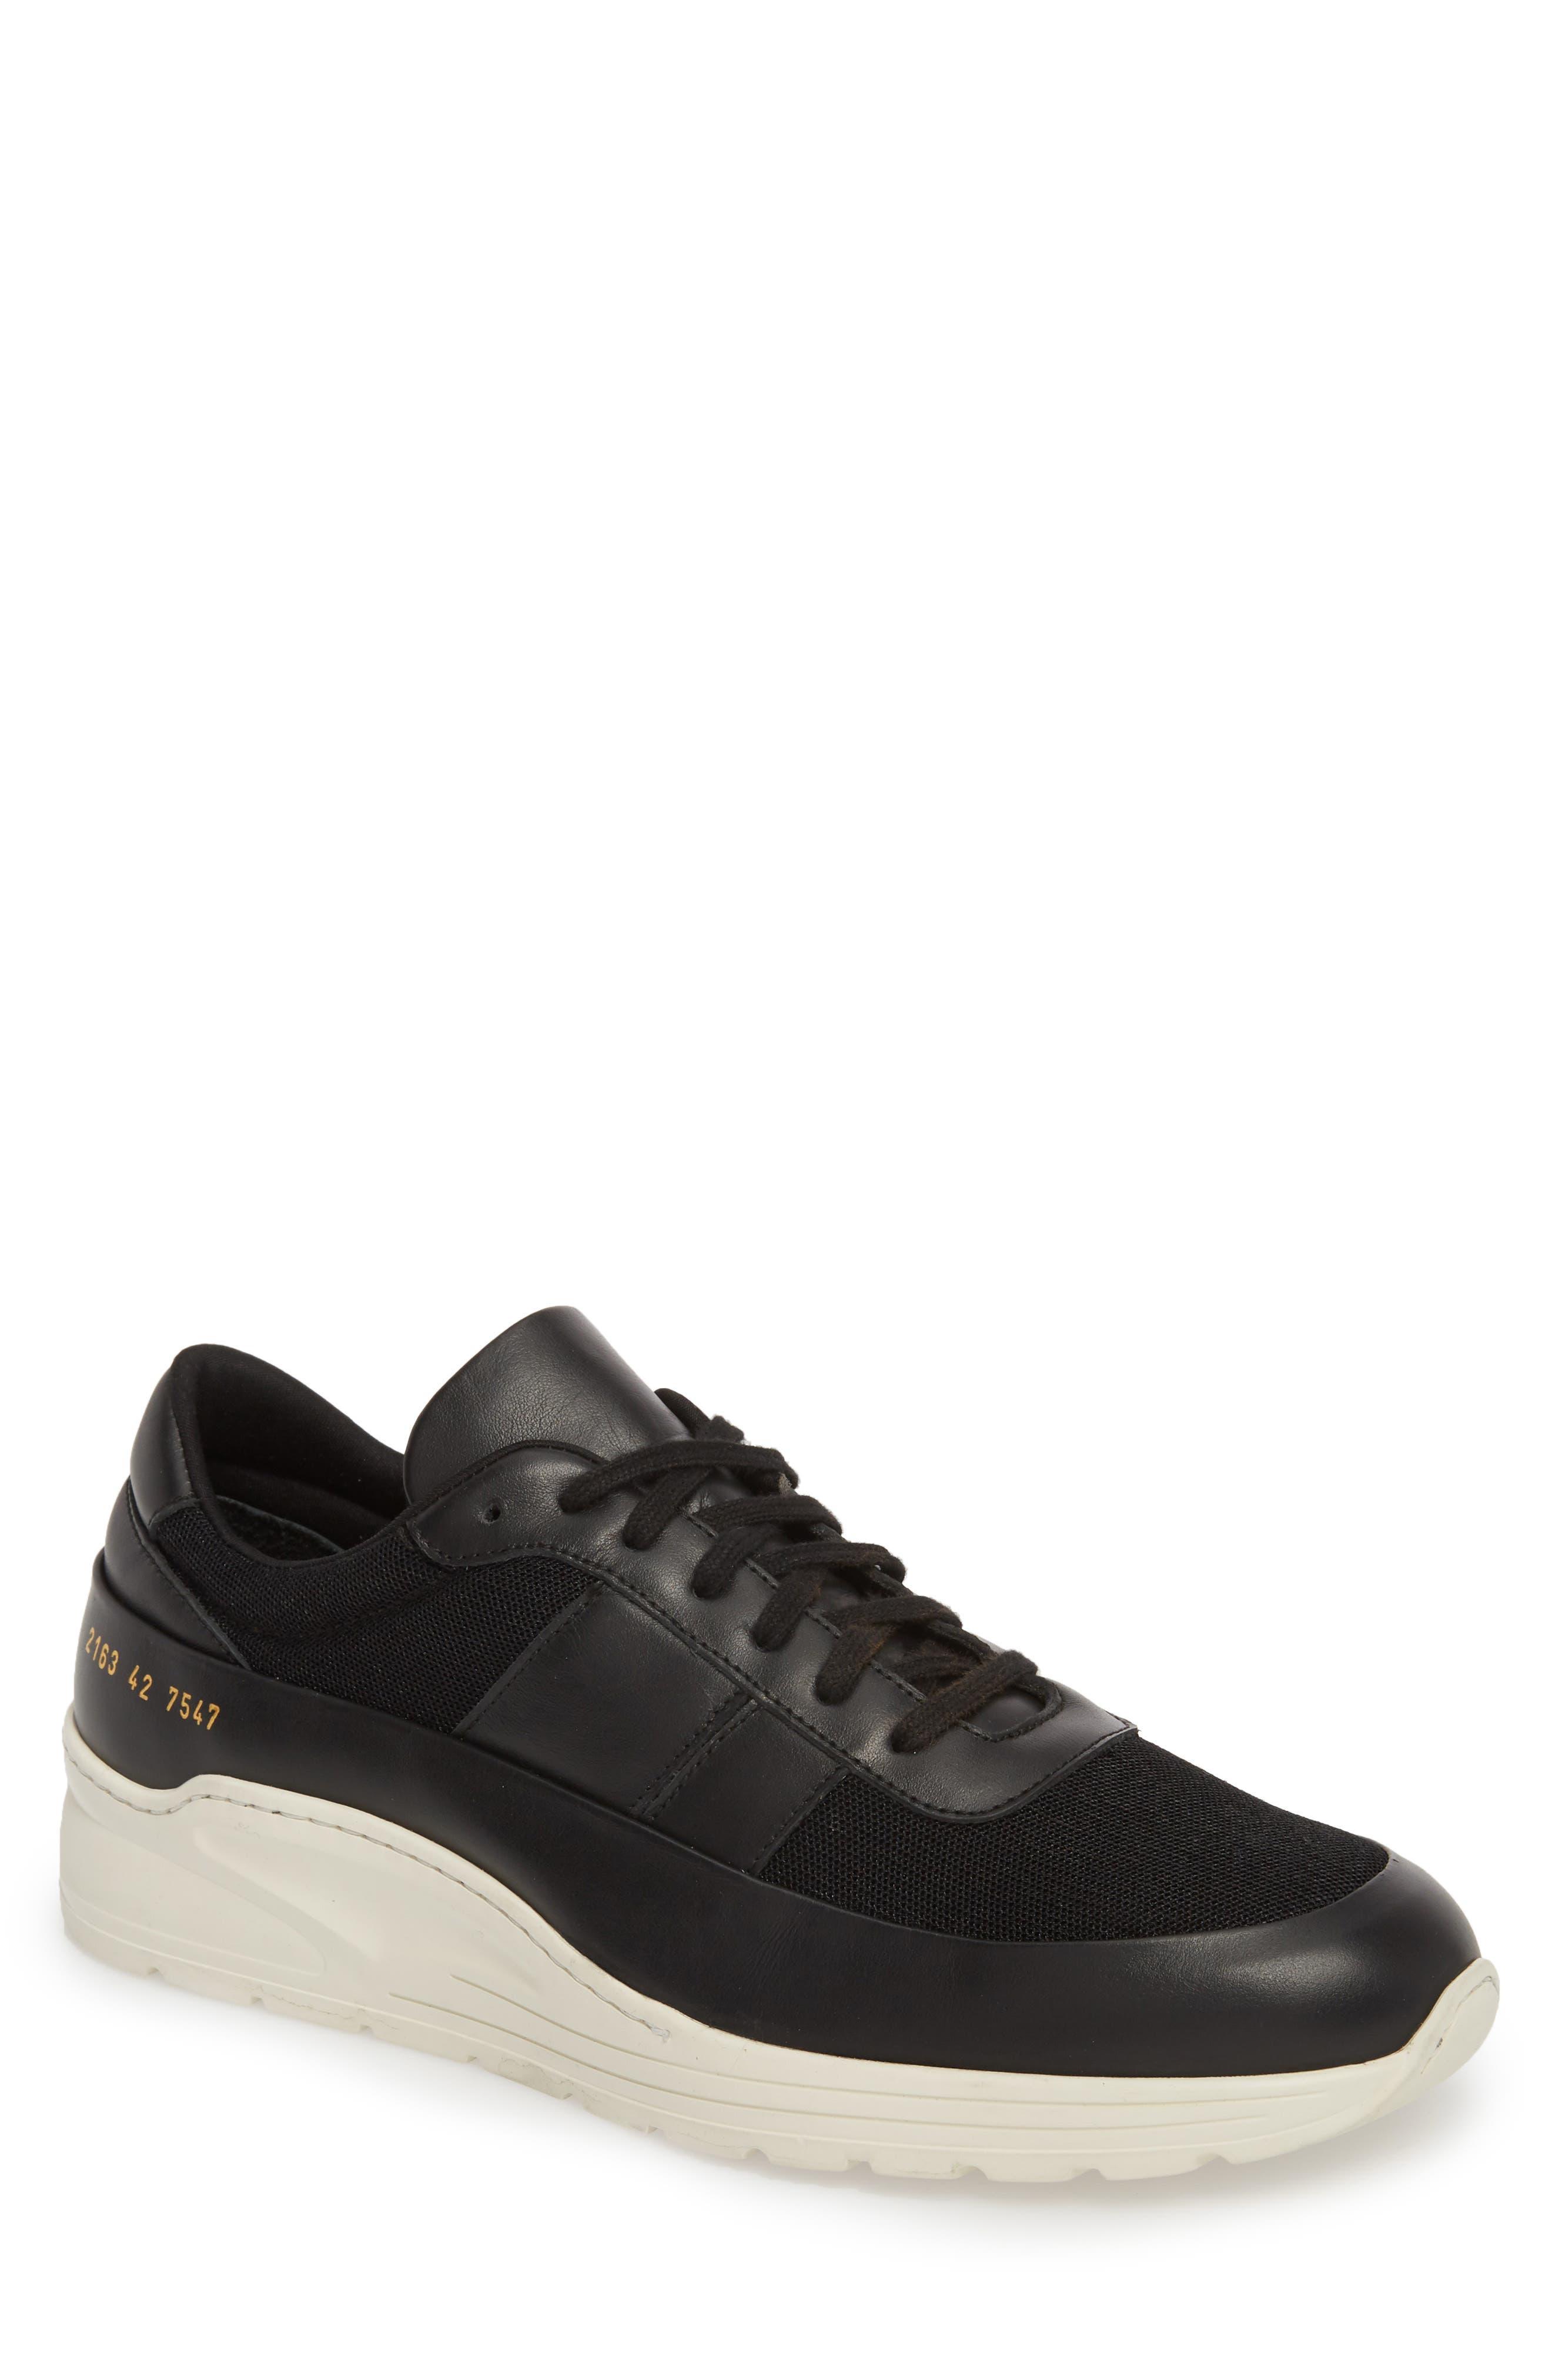 Track Super Low Top Sneaker,                         Main,                         color, 001